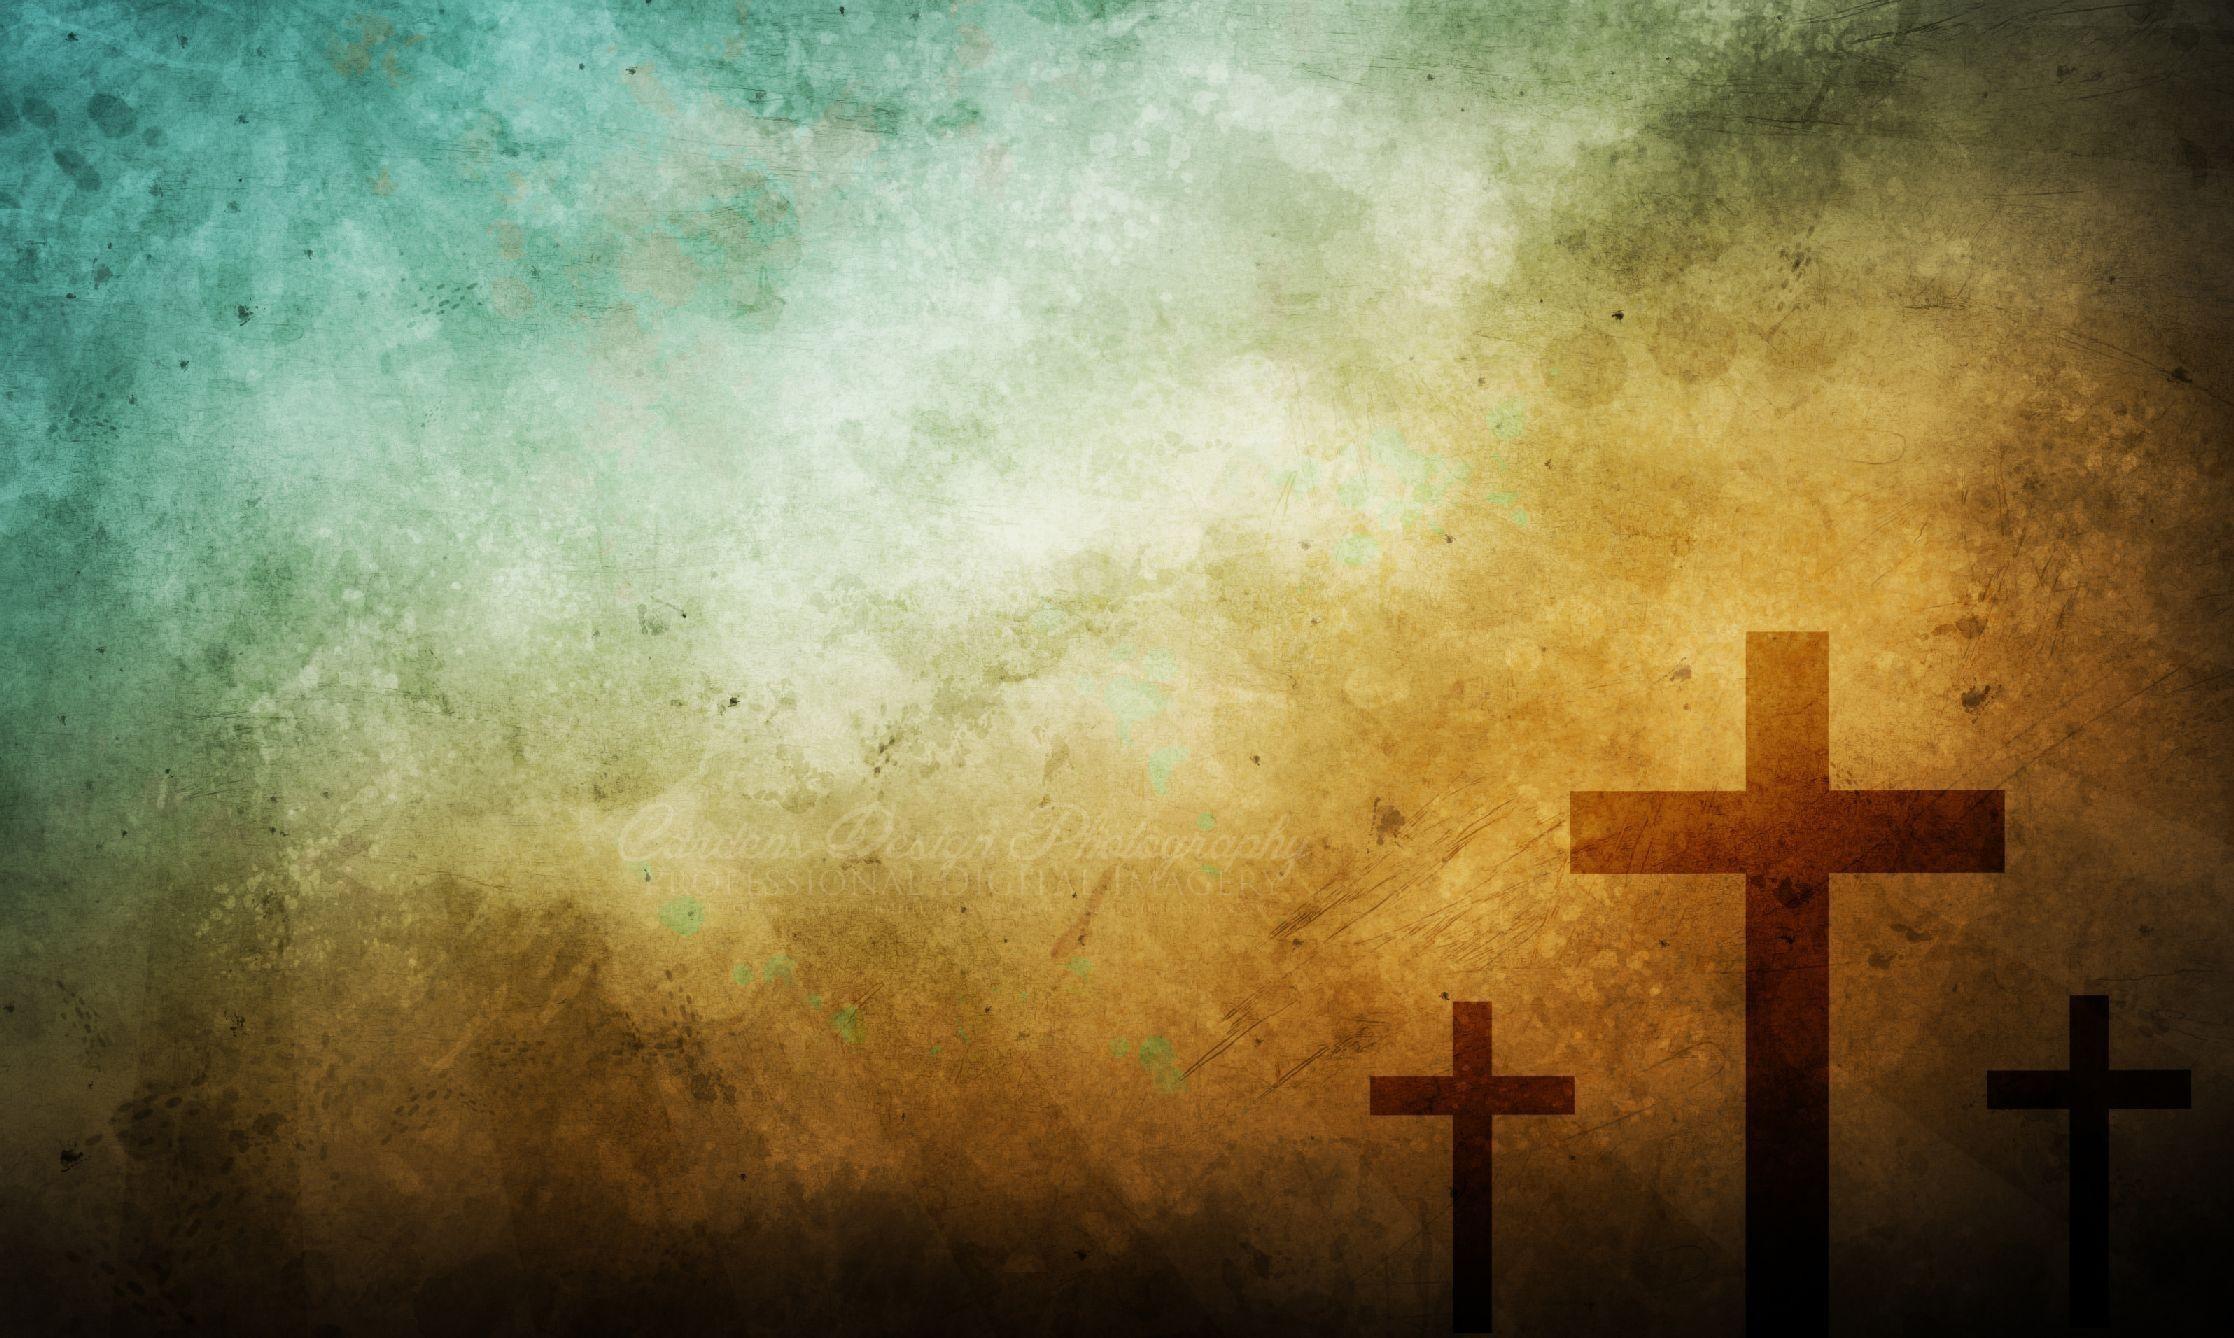 56 Religious Desktop Wallpapers on WallpaperPlay 2234x1338